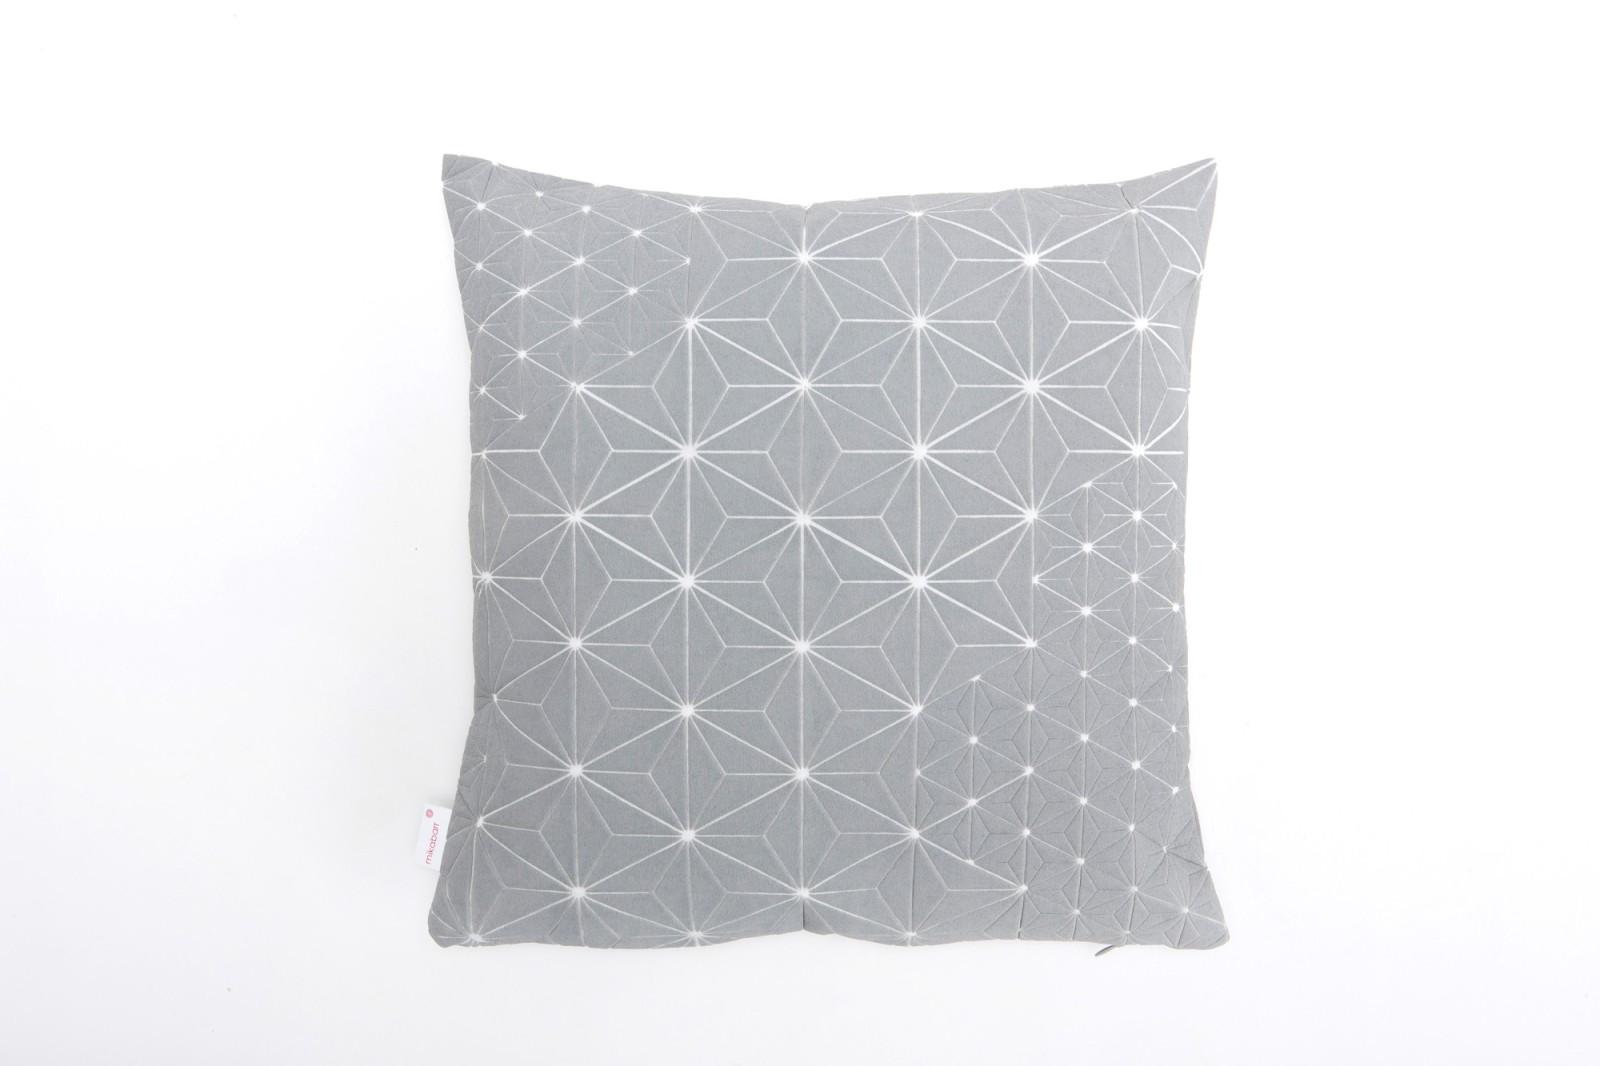 Tamara Cushion Square Cushion Cover Tamara Grey & White